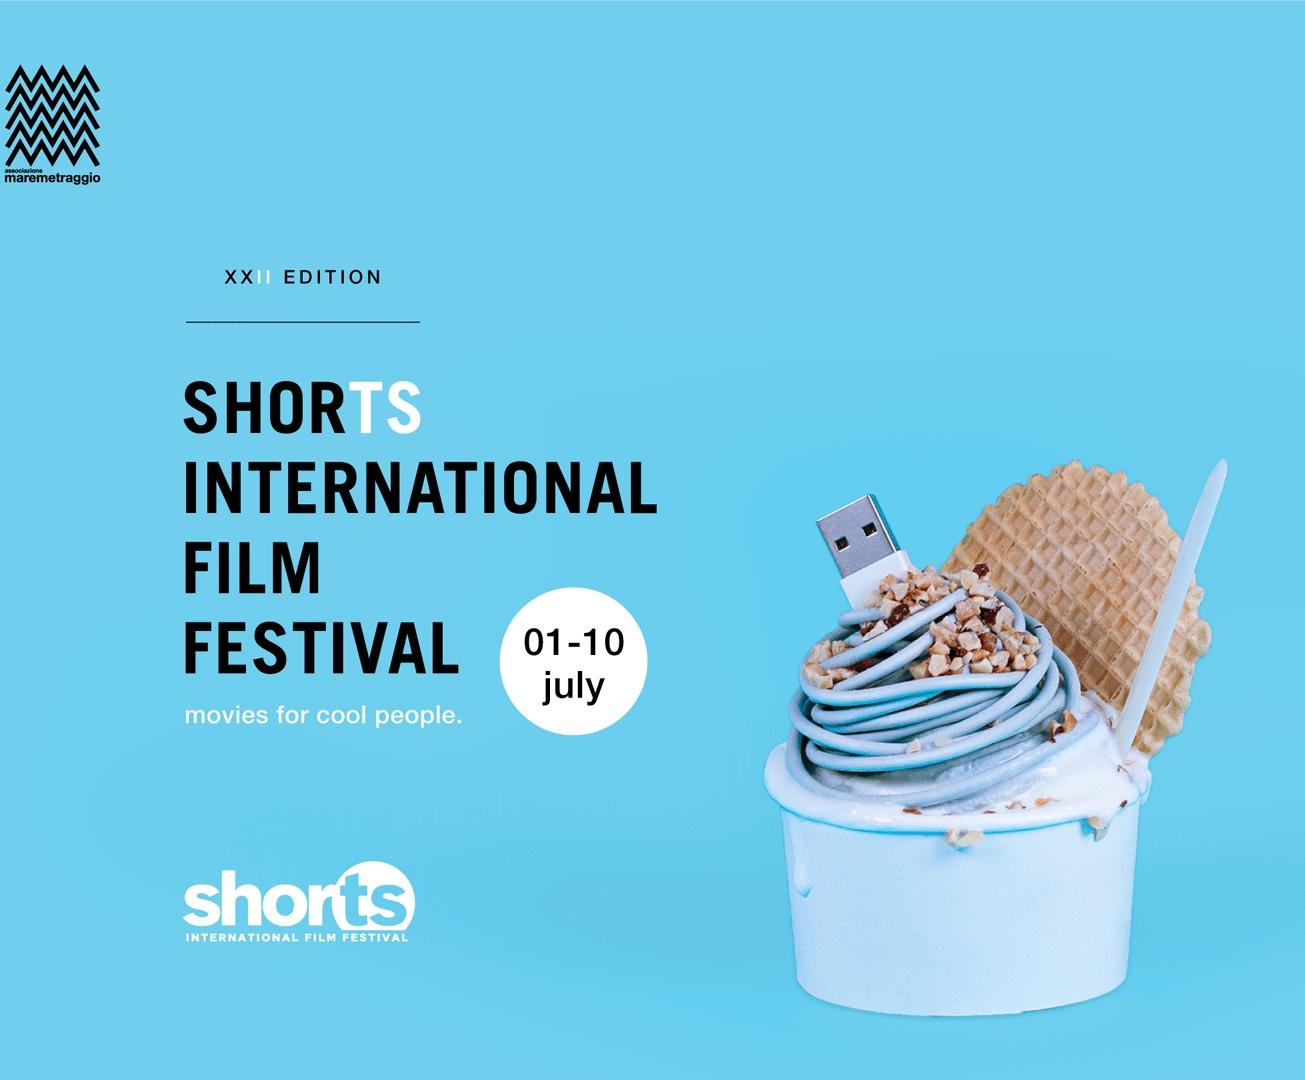 La Realtà Virtuale torna a Trieste con ShorTS International Film Festival 2021